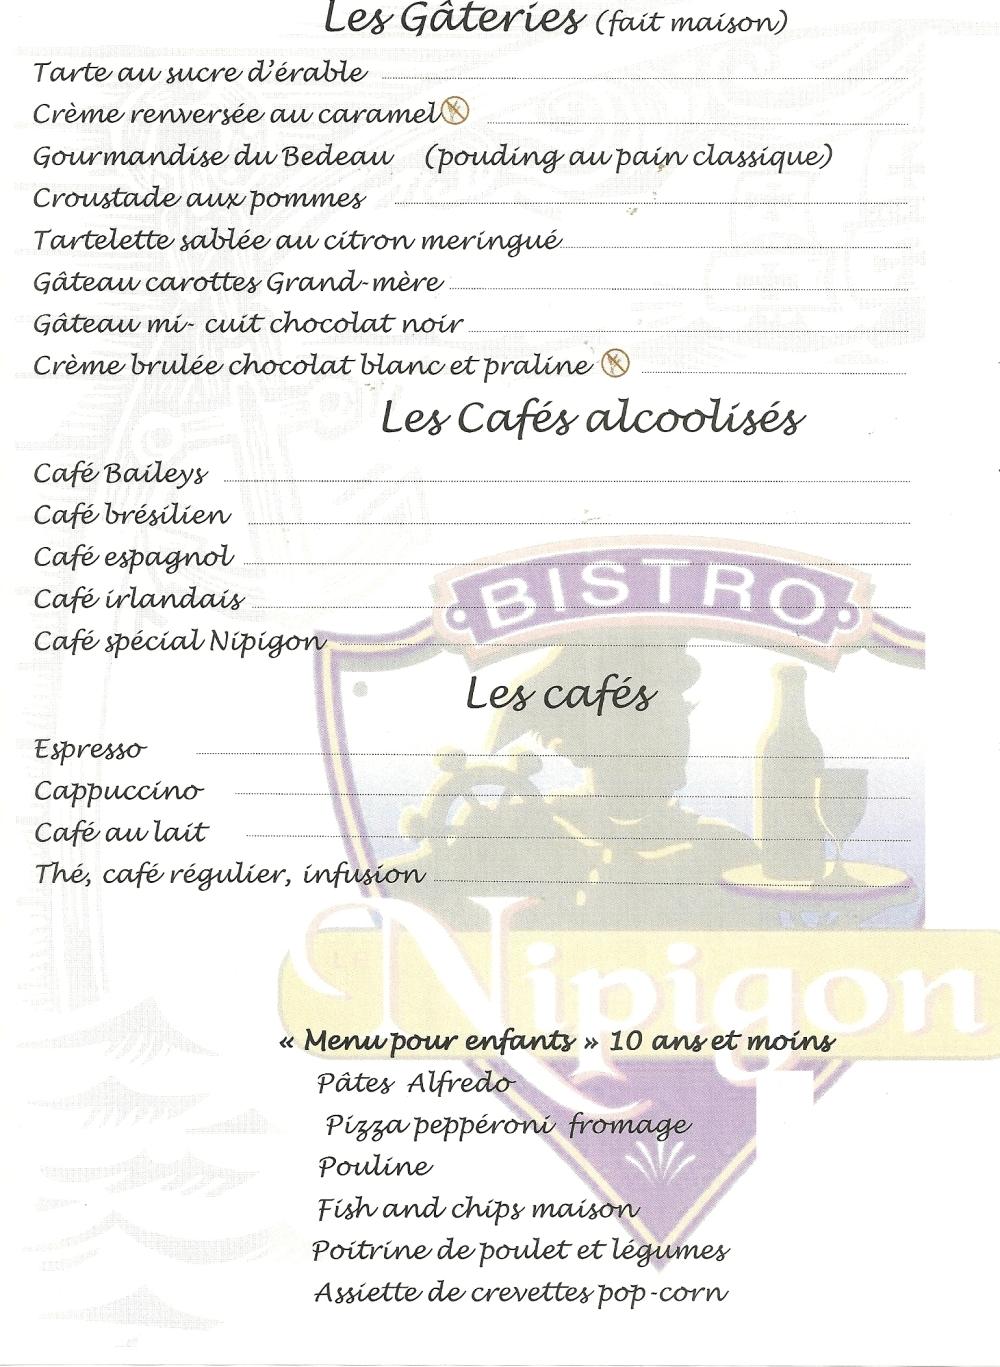 midi - gateries + cafés